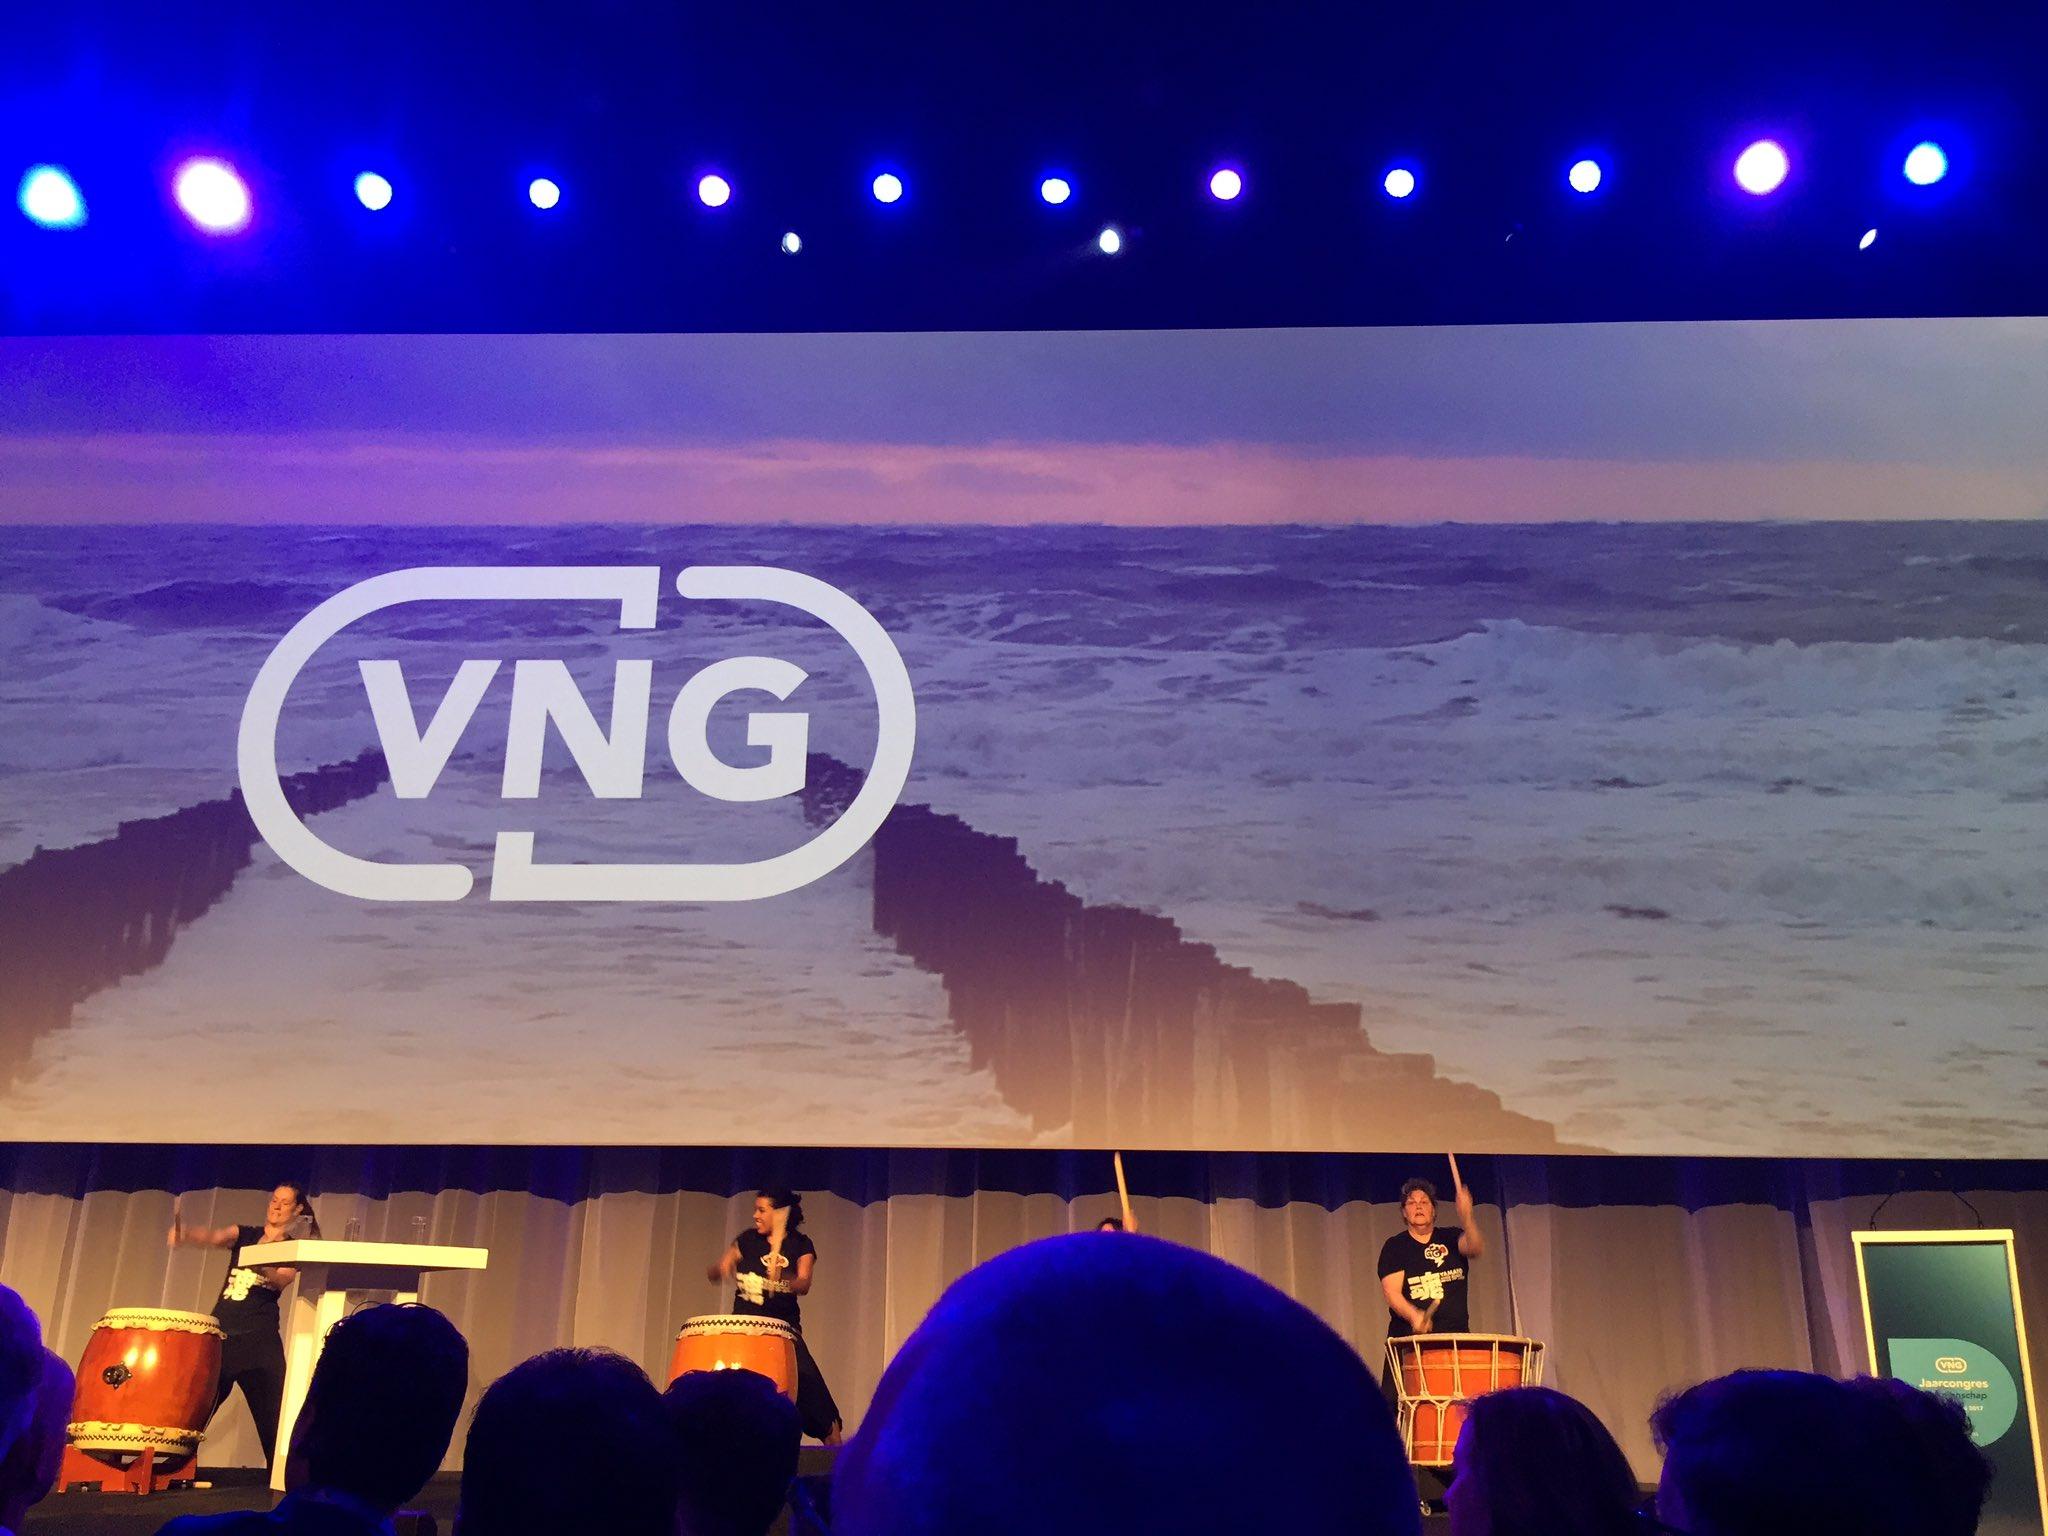 Opening #VNGcongres2017 https://t.co/J5lLDfYfit